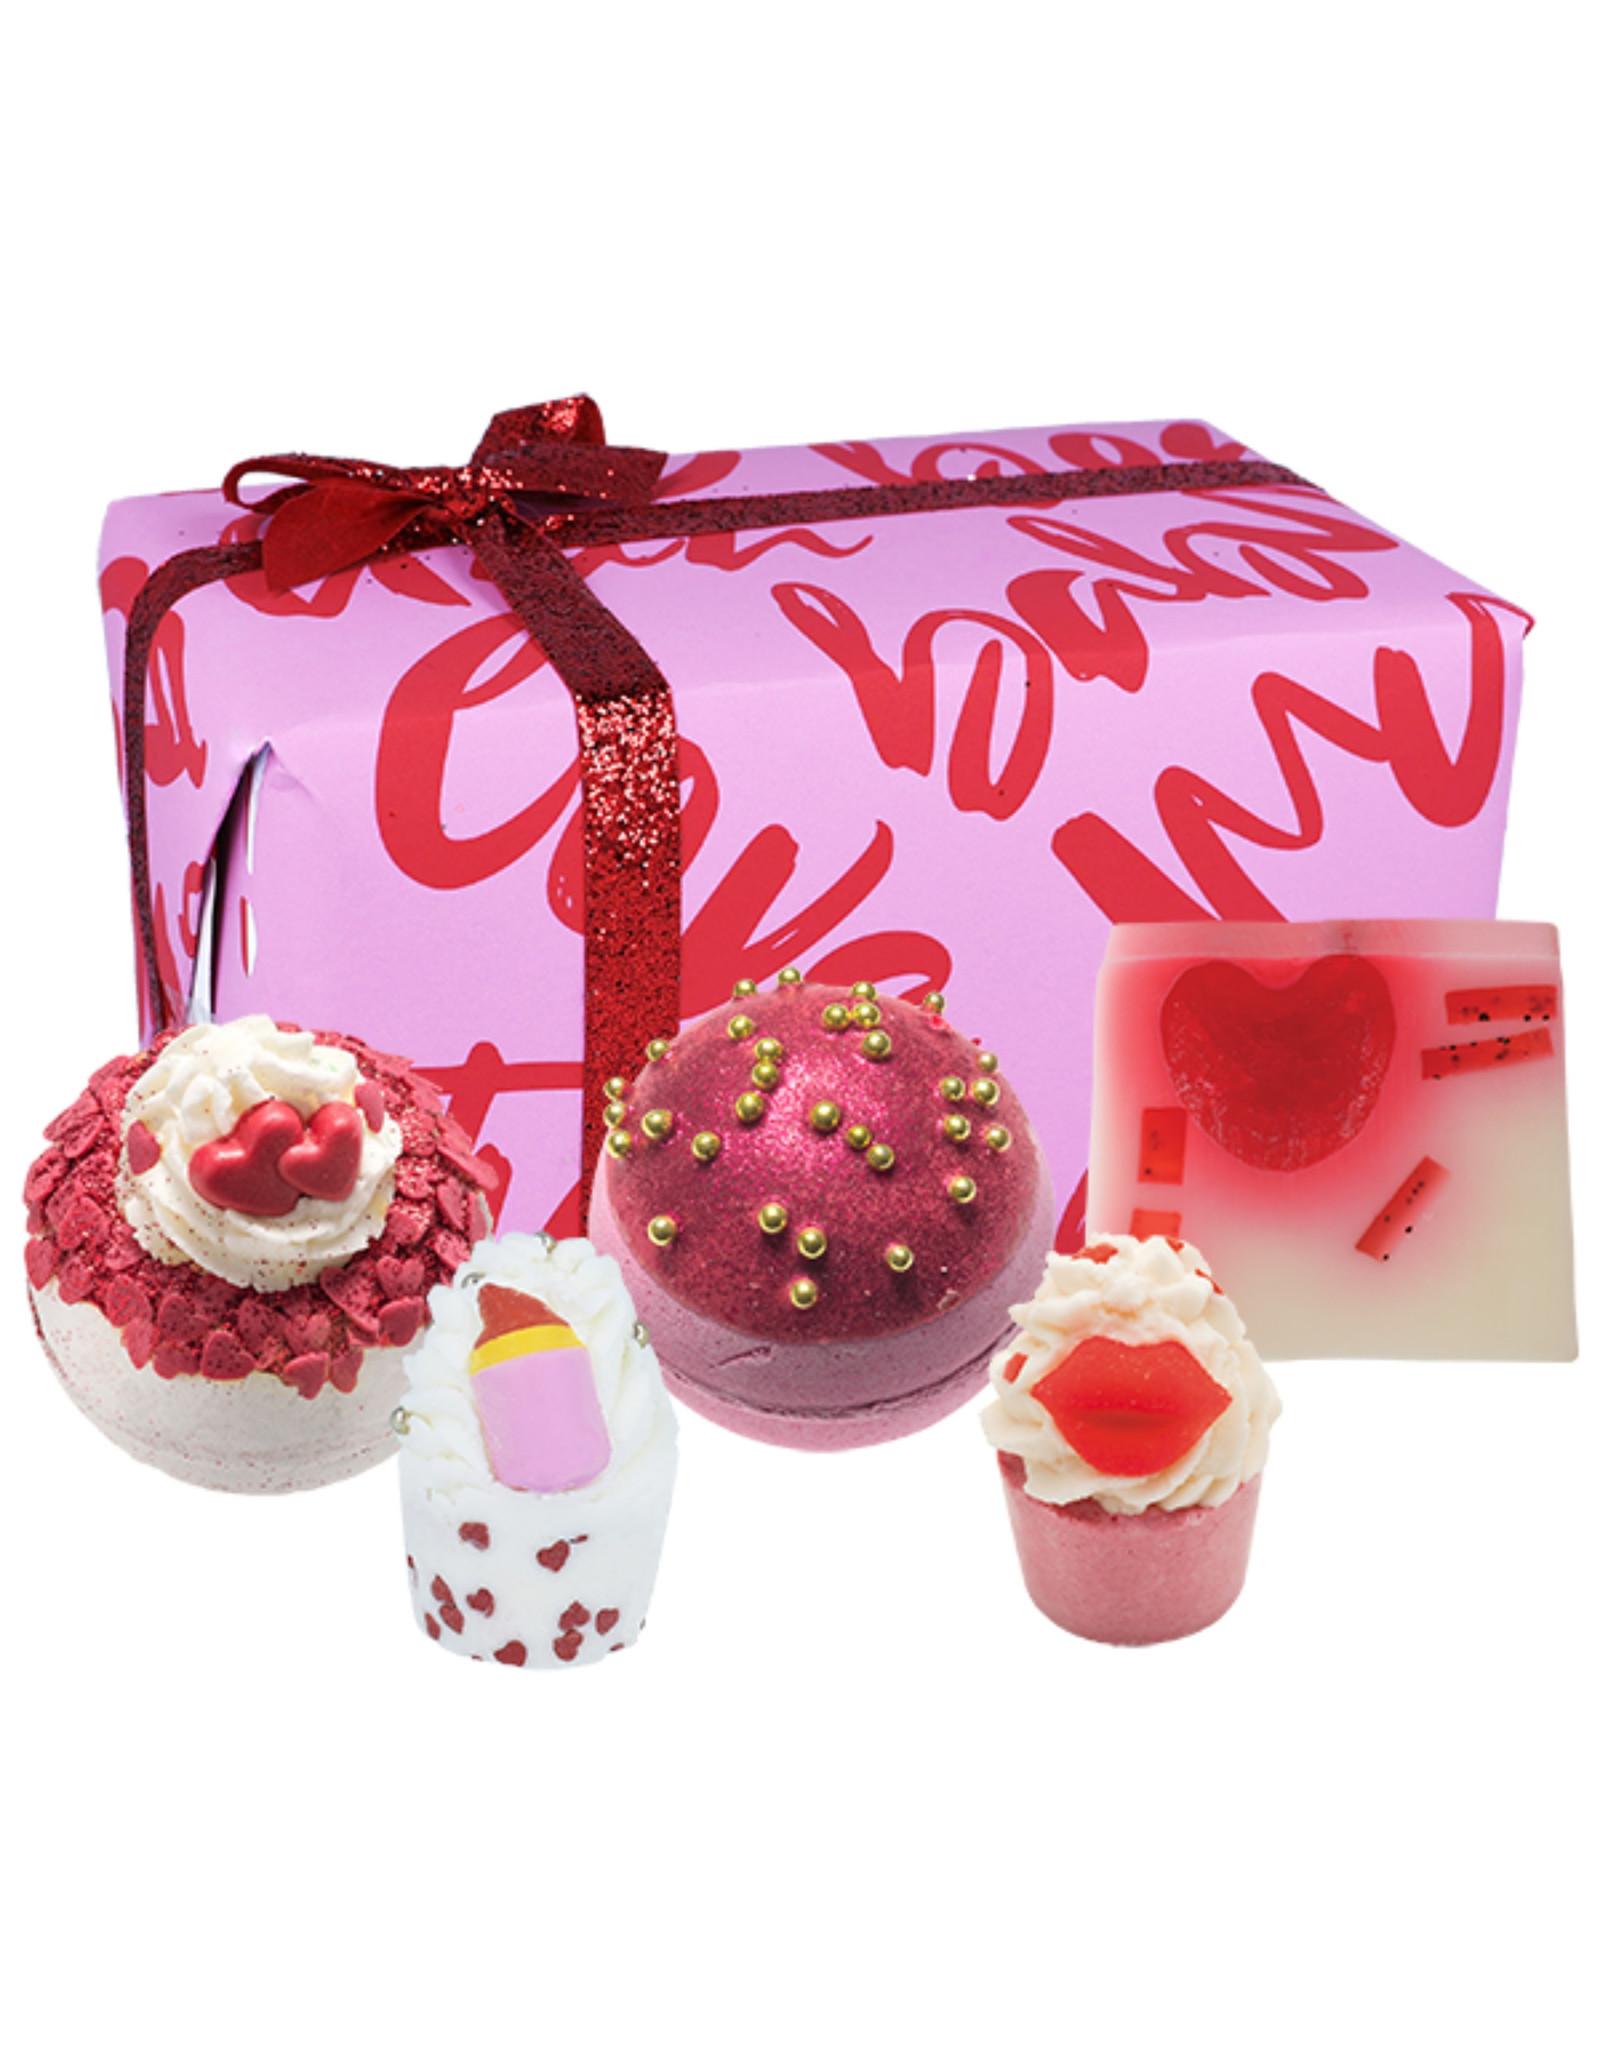 Bomb Cosmetics Giftbox - Date Night